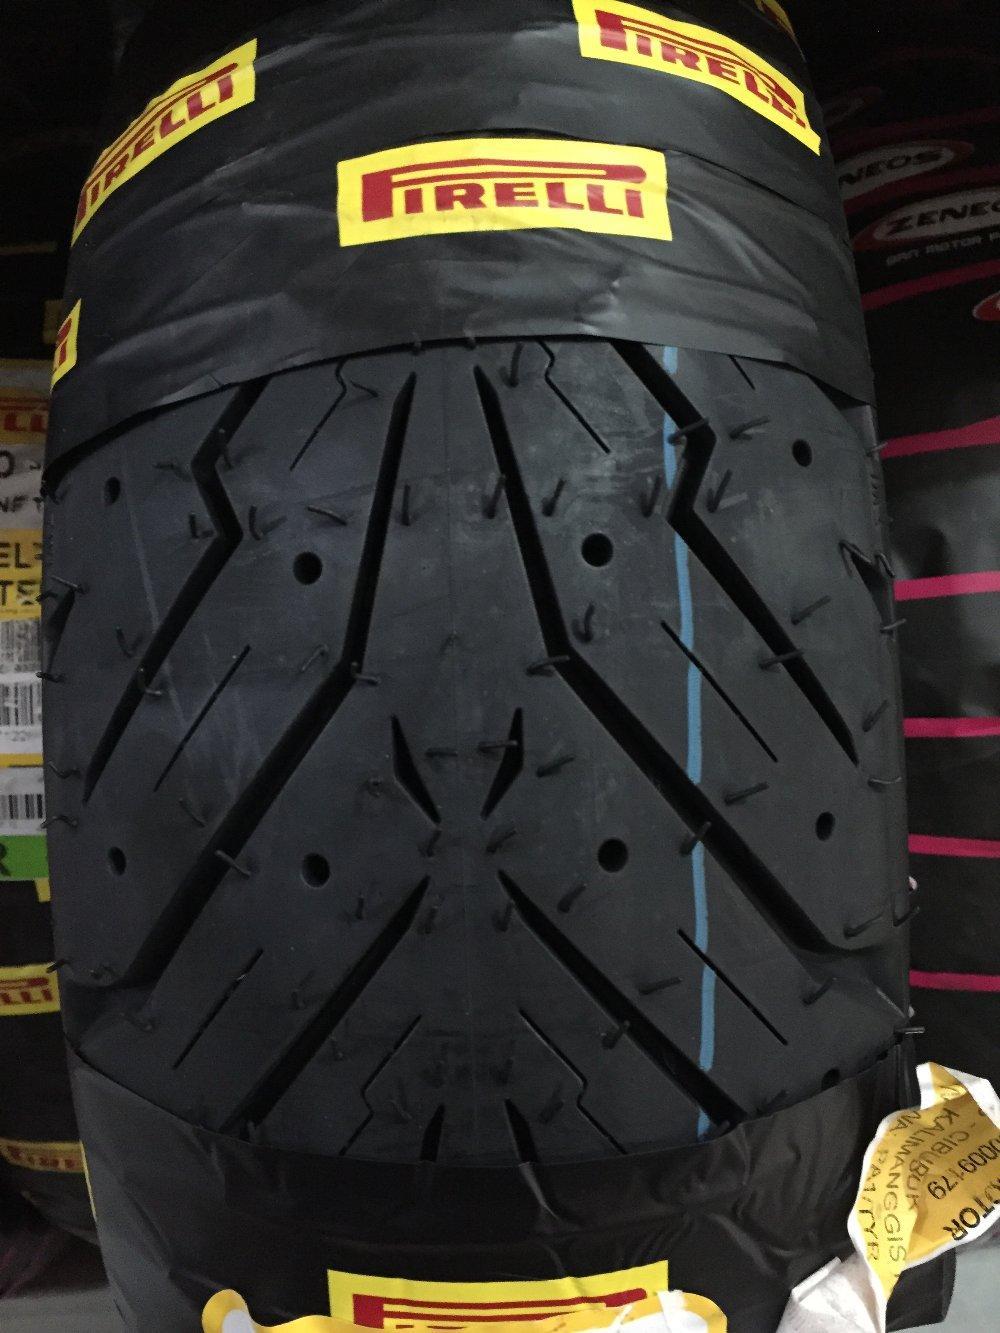 Fitur Pirelli Angel Scooter 130 70 13 Ban Nmax Belakang Aksesoris Zeneos Milano 87 12 Detail Gambar Terbaru